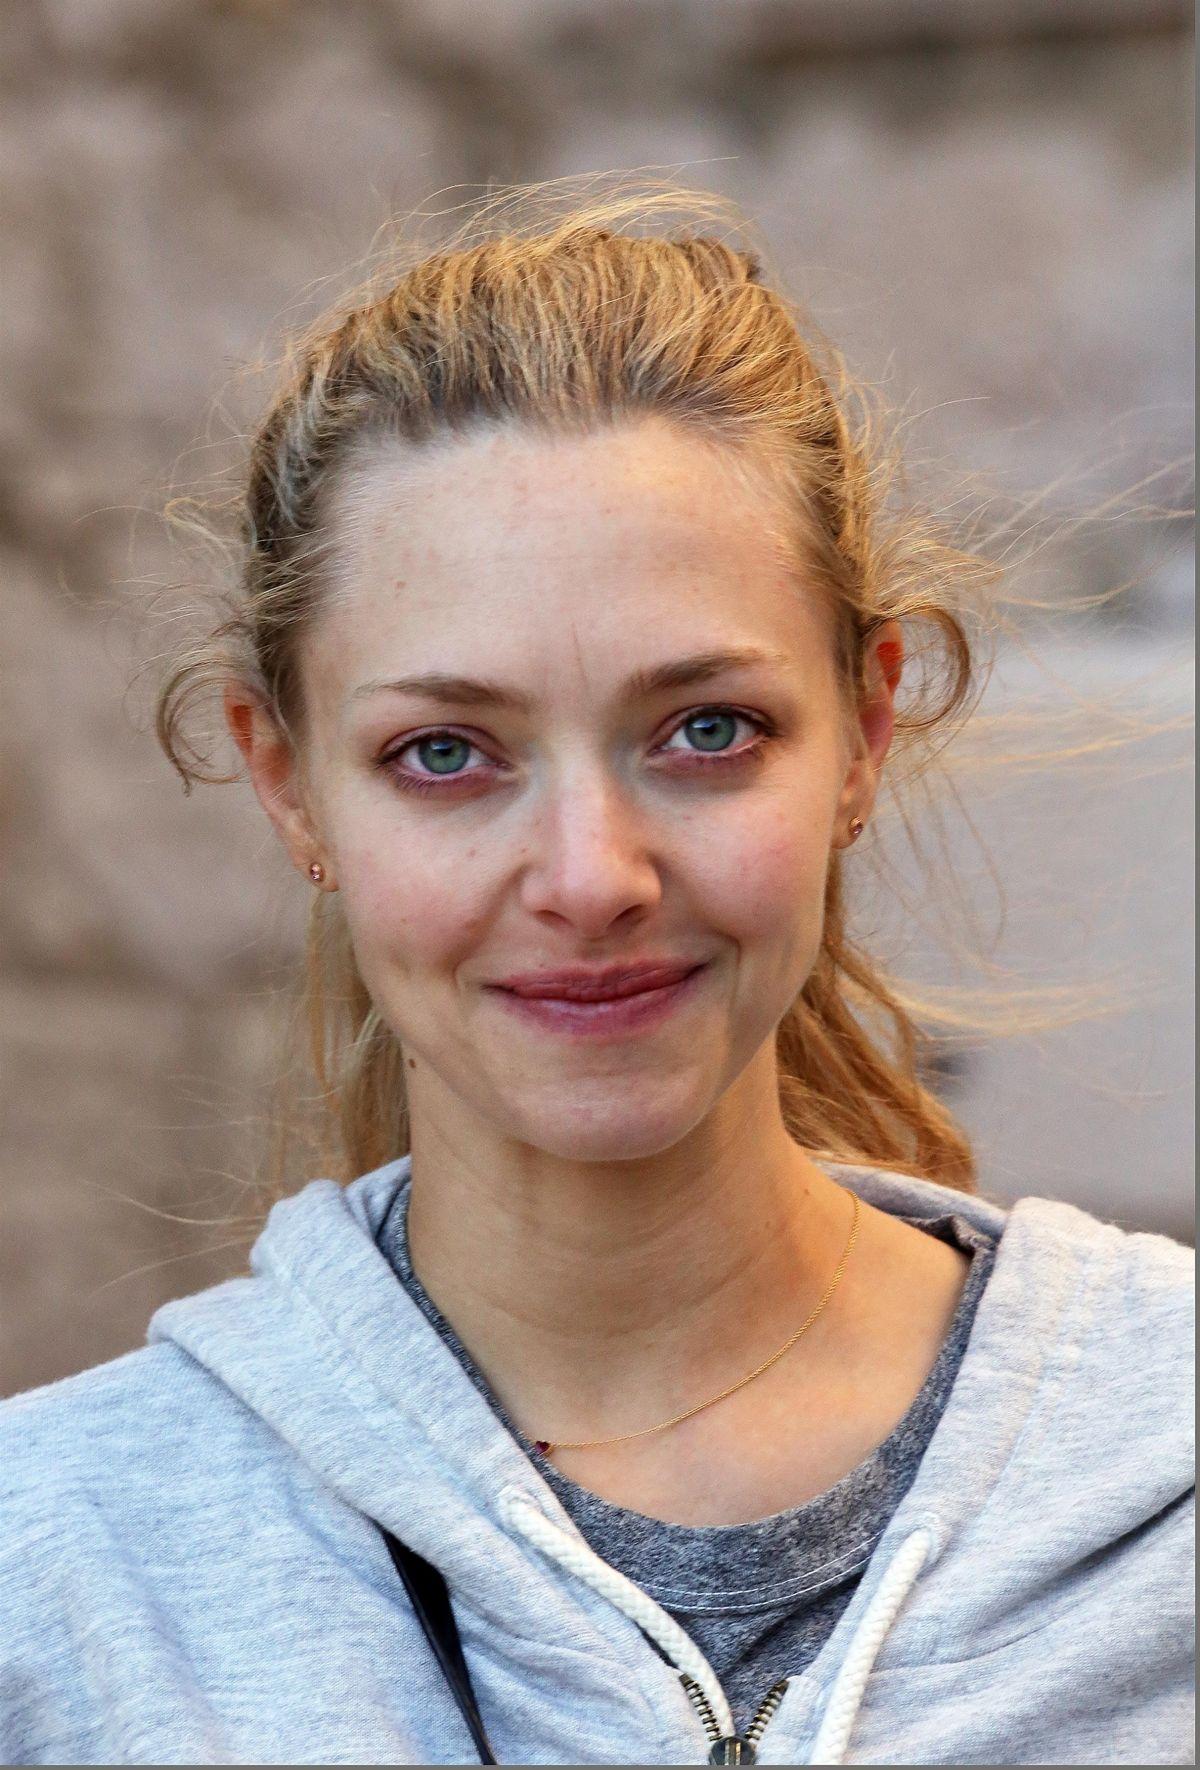 AMANDA SEYFRIED Makeup Free Out in Croatia 09/21/2017 ... Amanda Seyfried Website